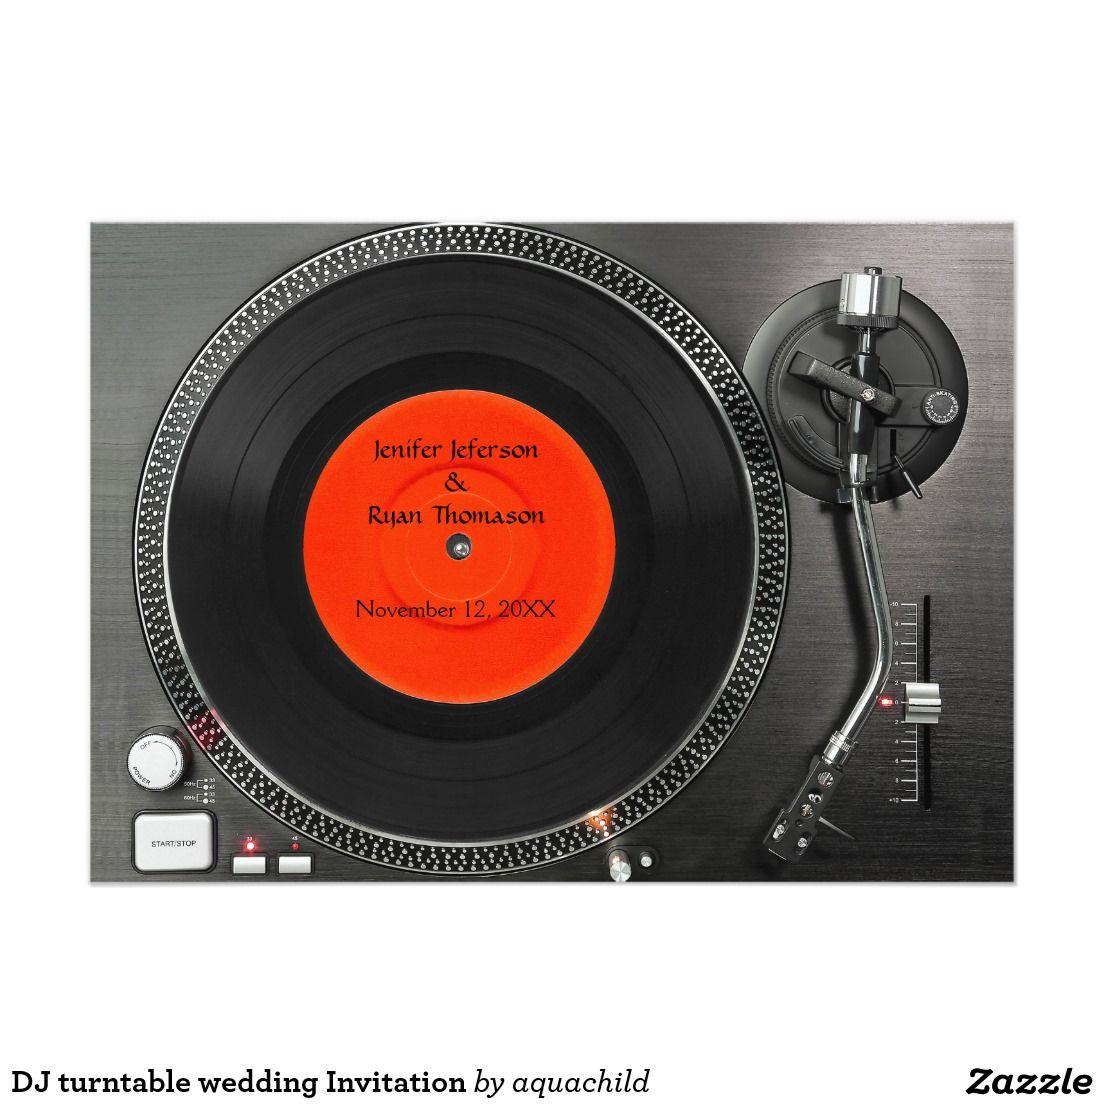 DJ turntable wedding Invitation   sci fi themed   Pinterest   Zazzle ...